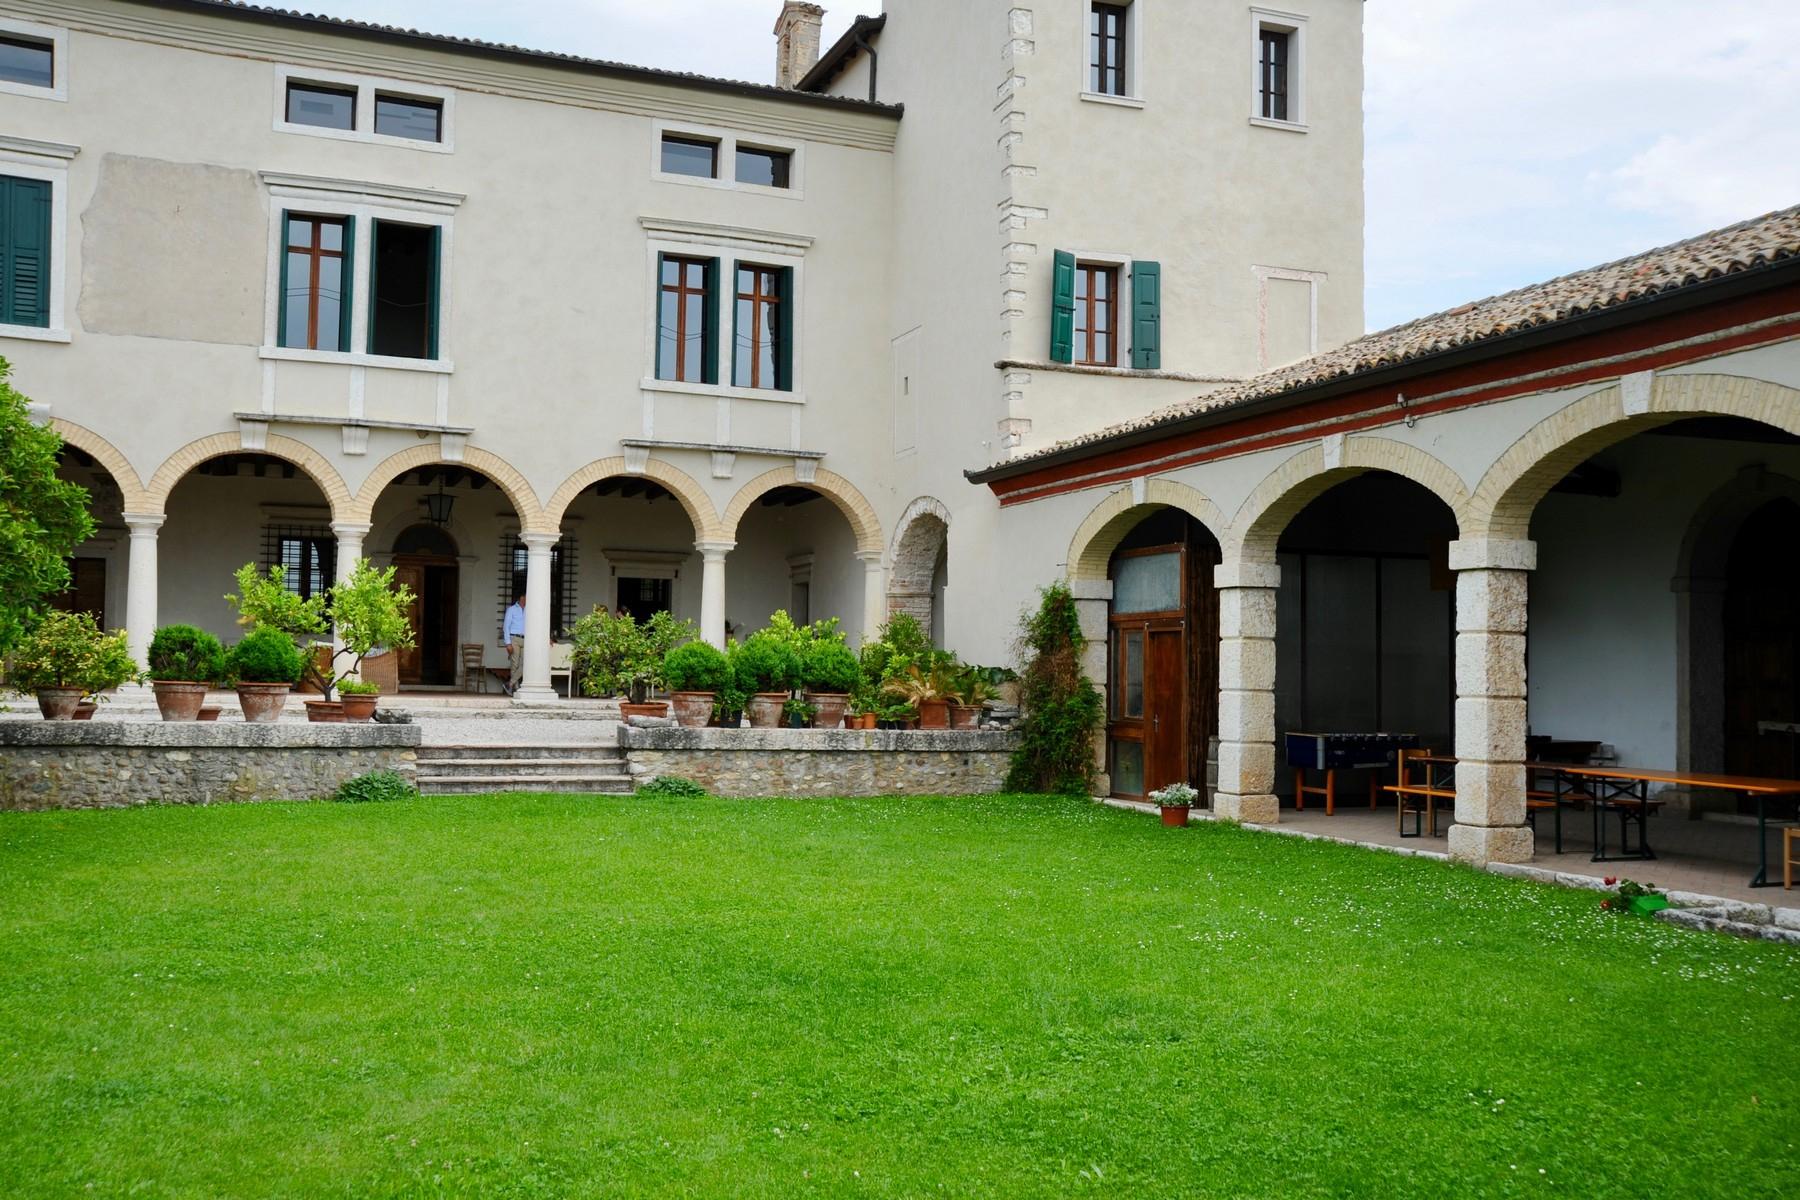 Villa in Vendita a Verona: 5 locali, 450 mq - Foto 24